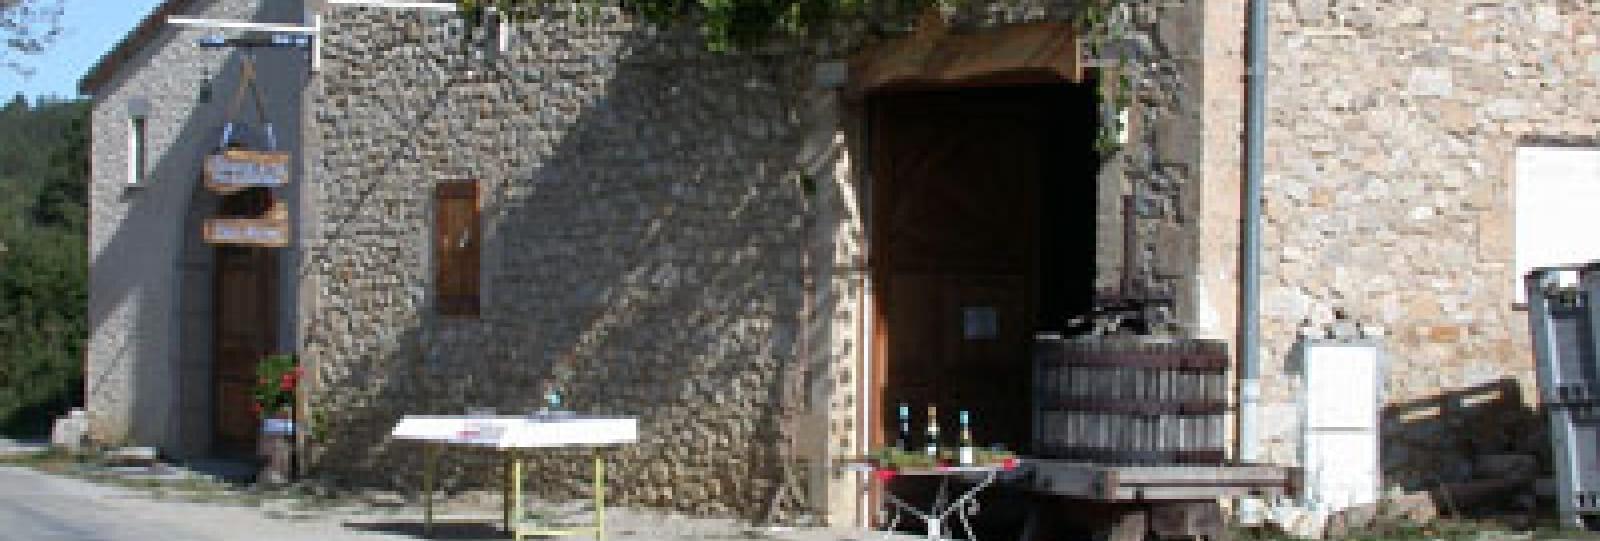 Cave Domaine des Gleyzes